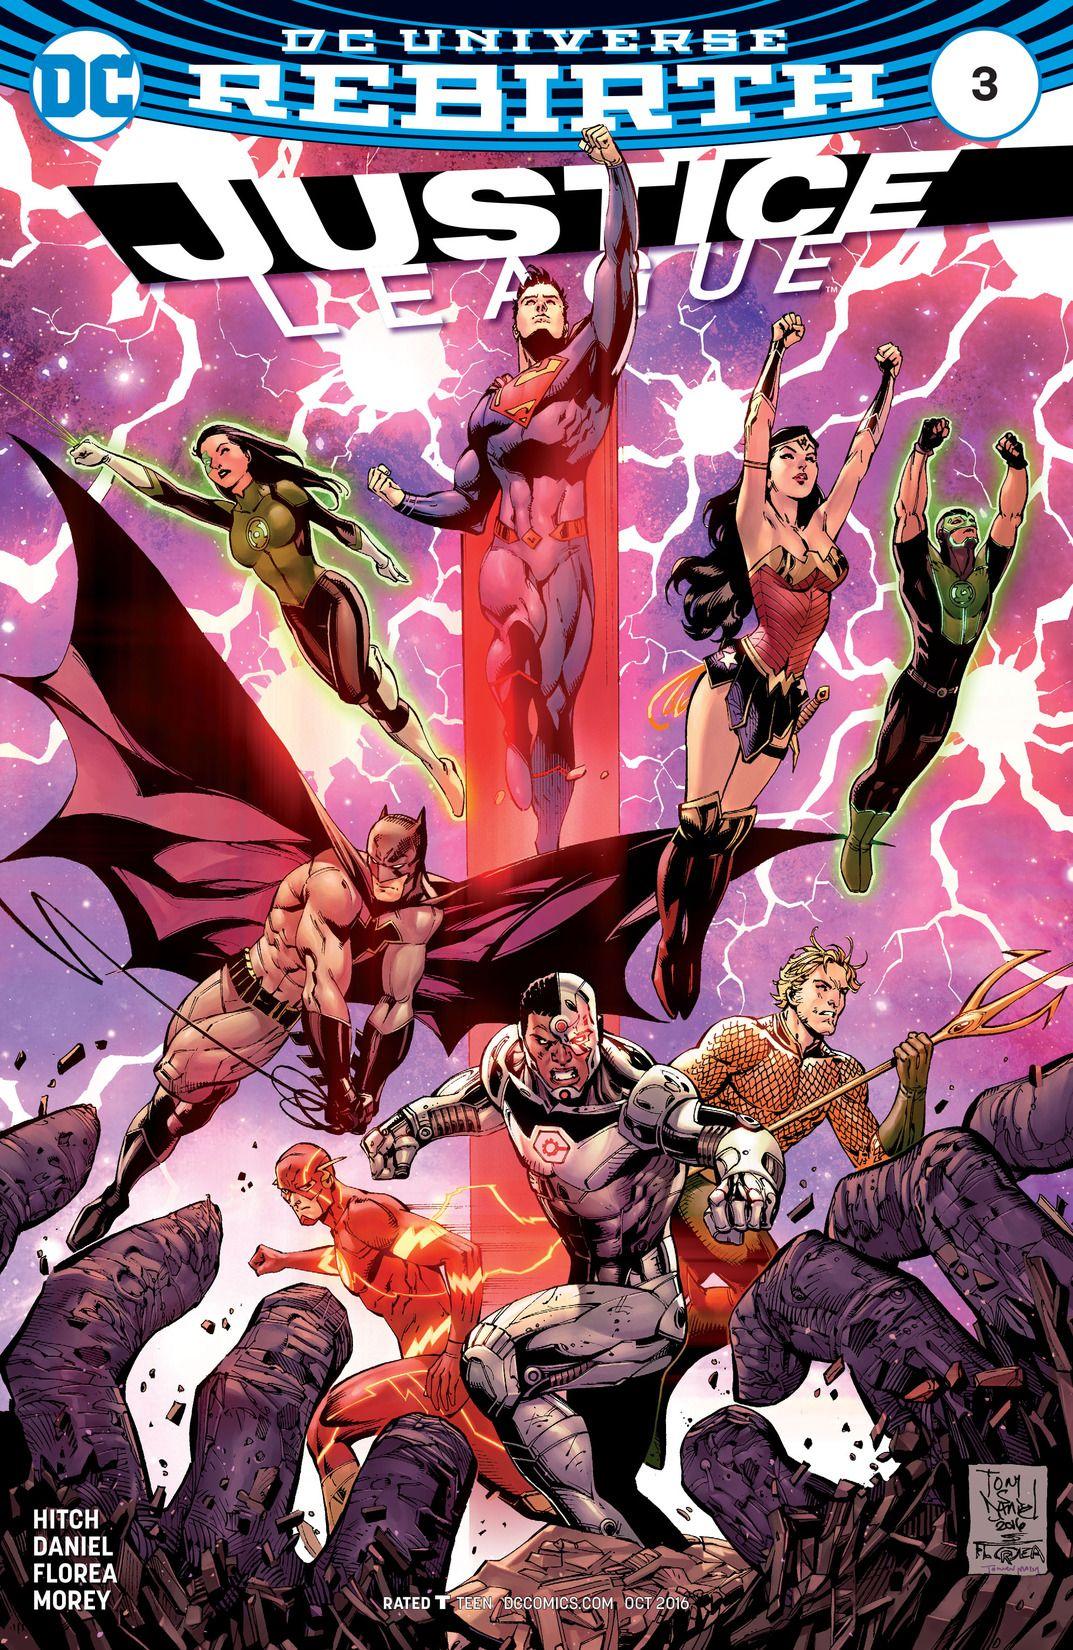 justice league review - photo #9